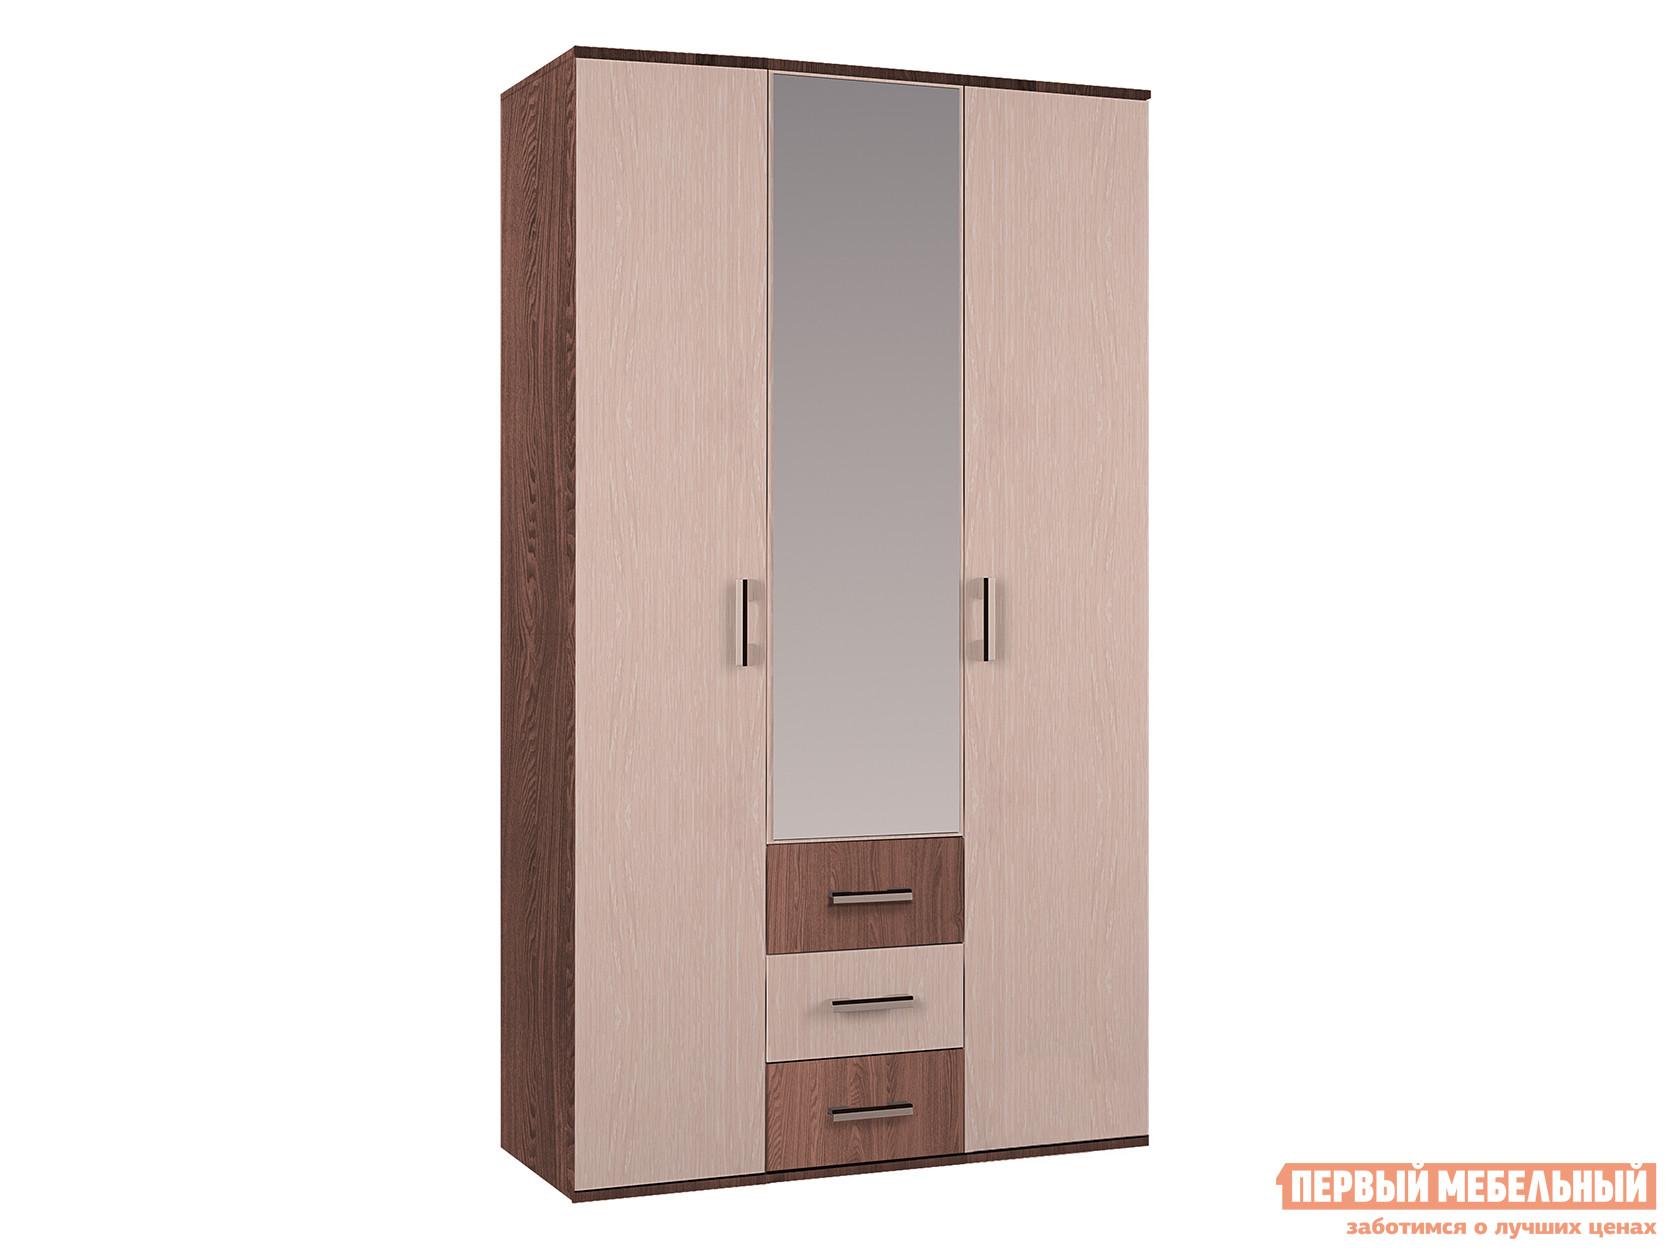 Шкаф распашной  Шкаф 3-х створчатый с зеркалом Белла Ясень шимо / Дуб 1